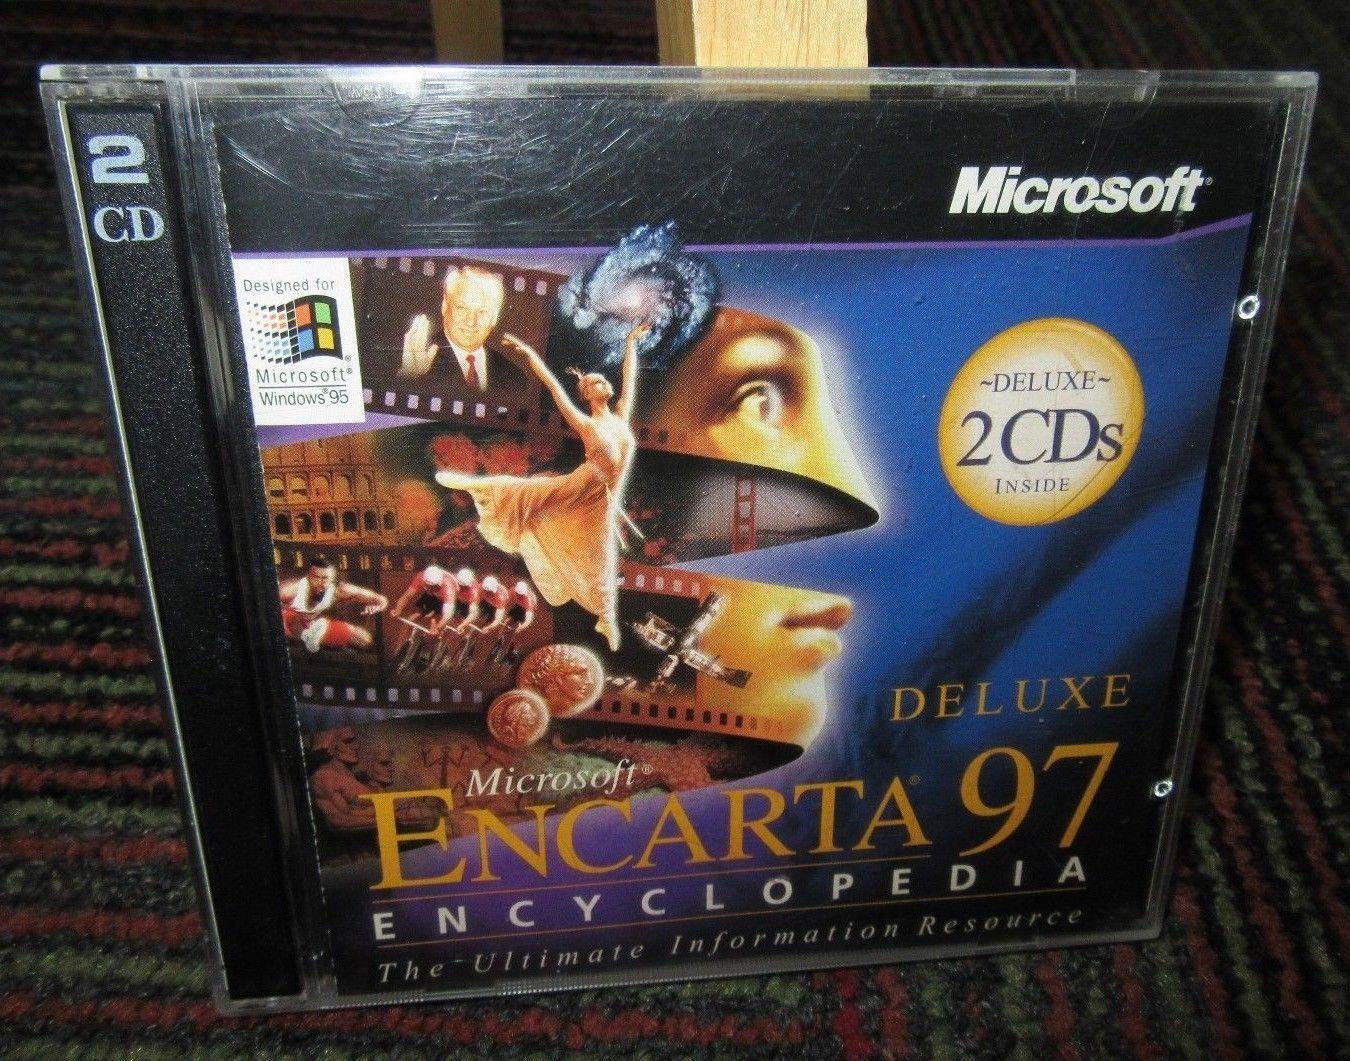 Microsoft encarta 97 deluxe encyclopedia and 50 similar items s l1600 m4hsunfo